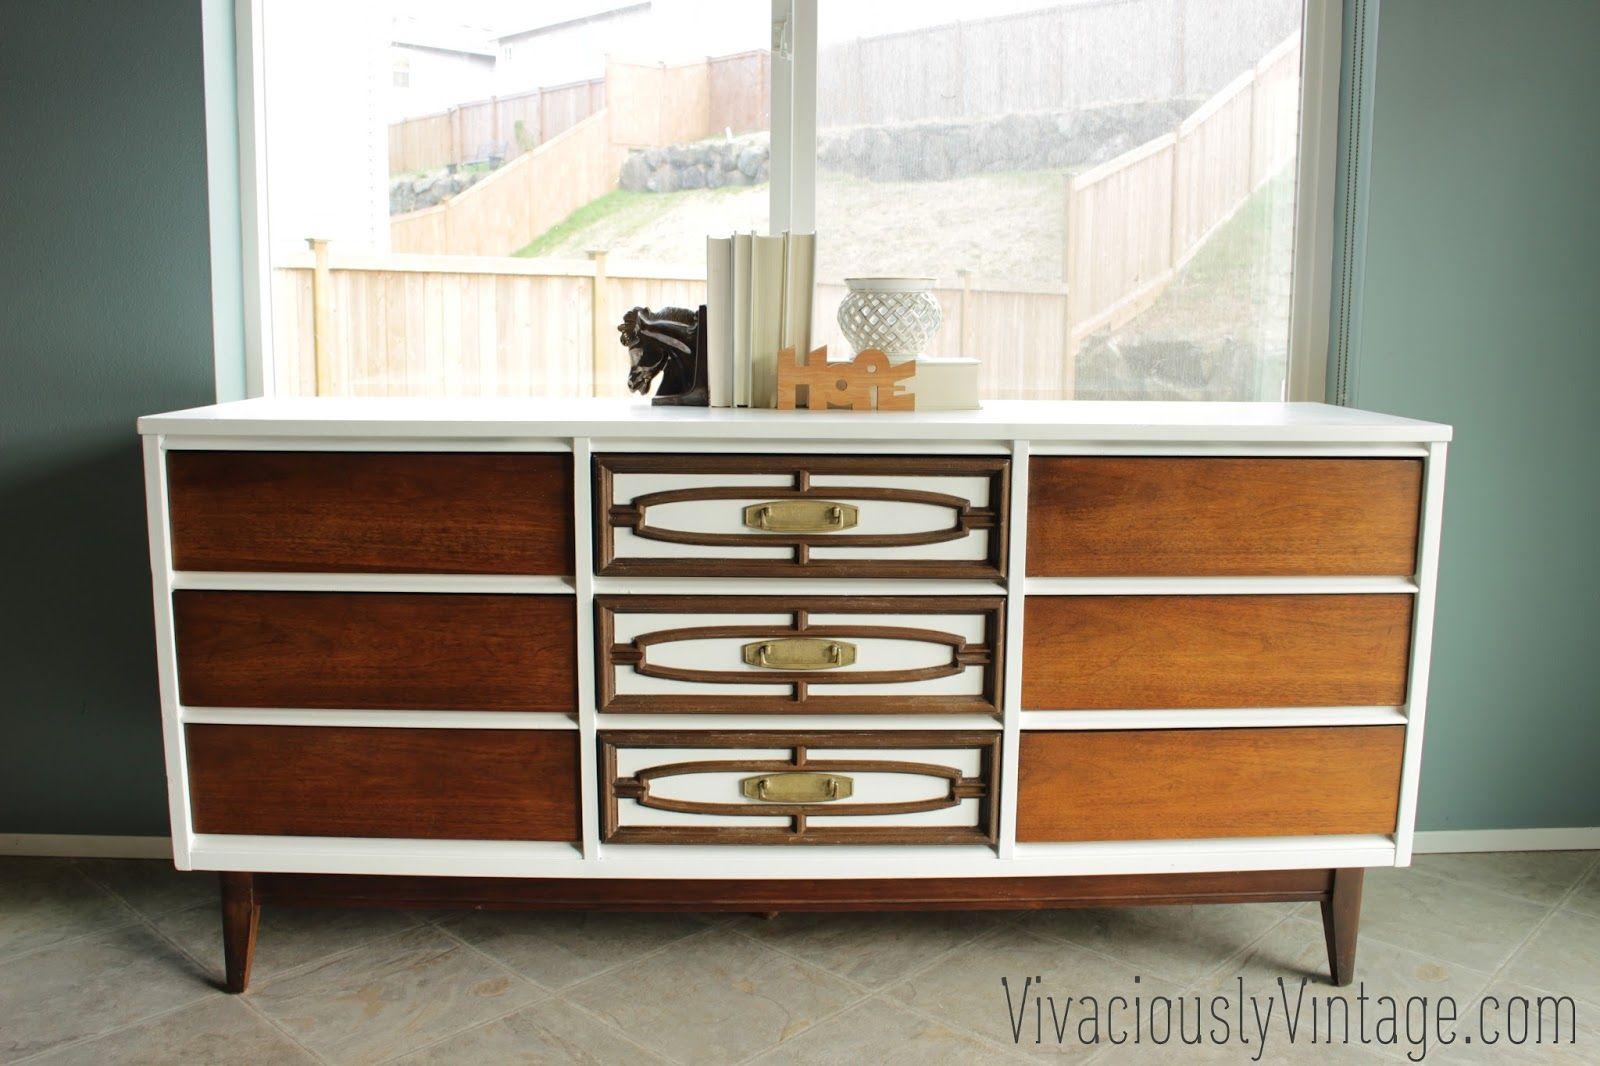 Best 2 Tone Mid Century Modern Avante Bassett Dresser Mid 400 x 300